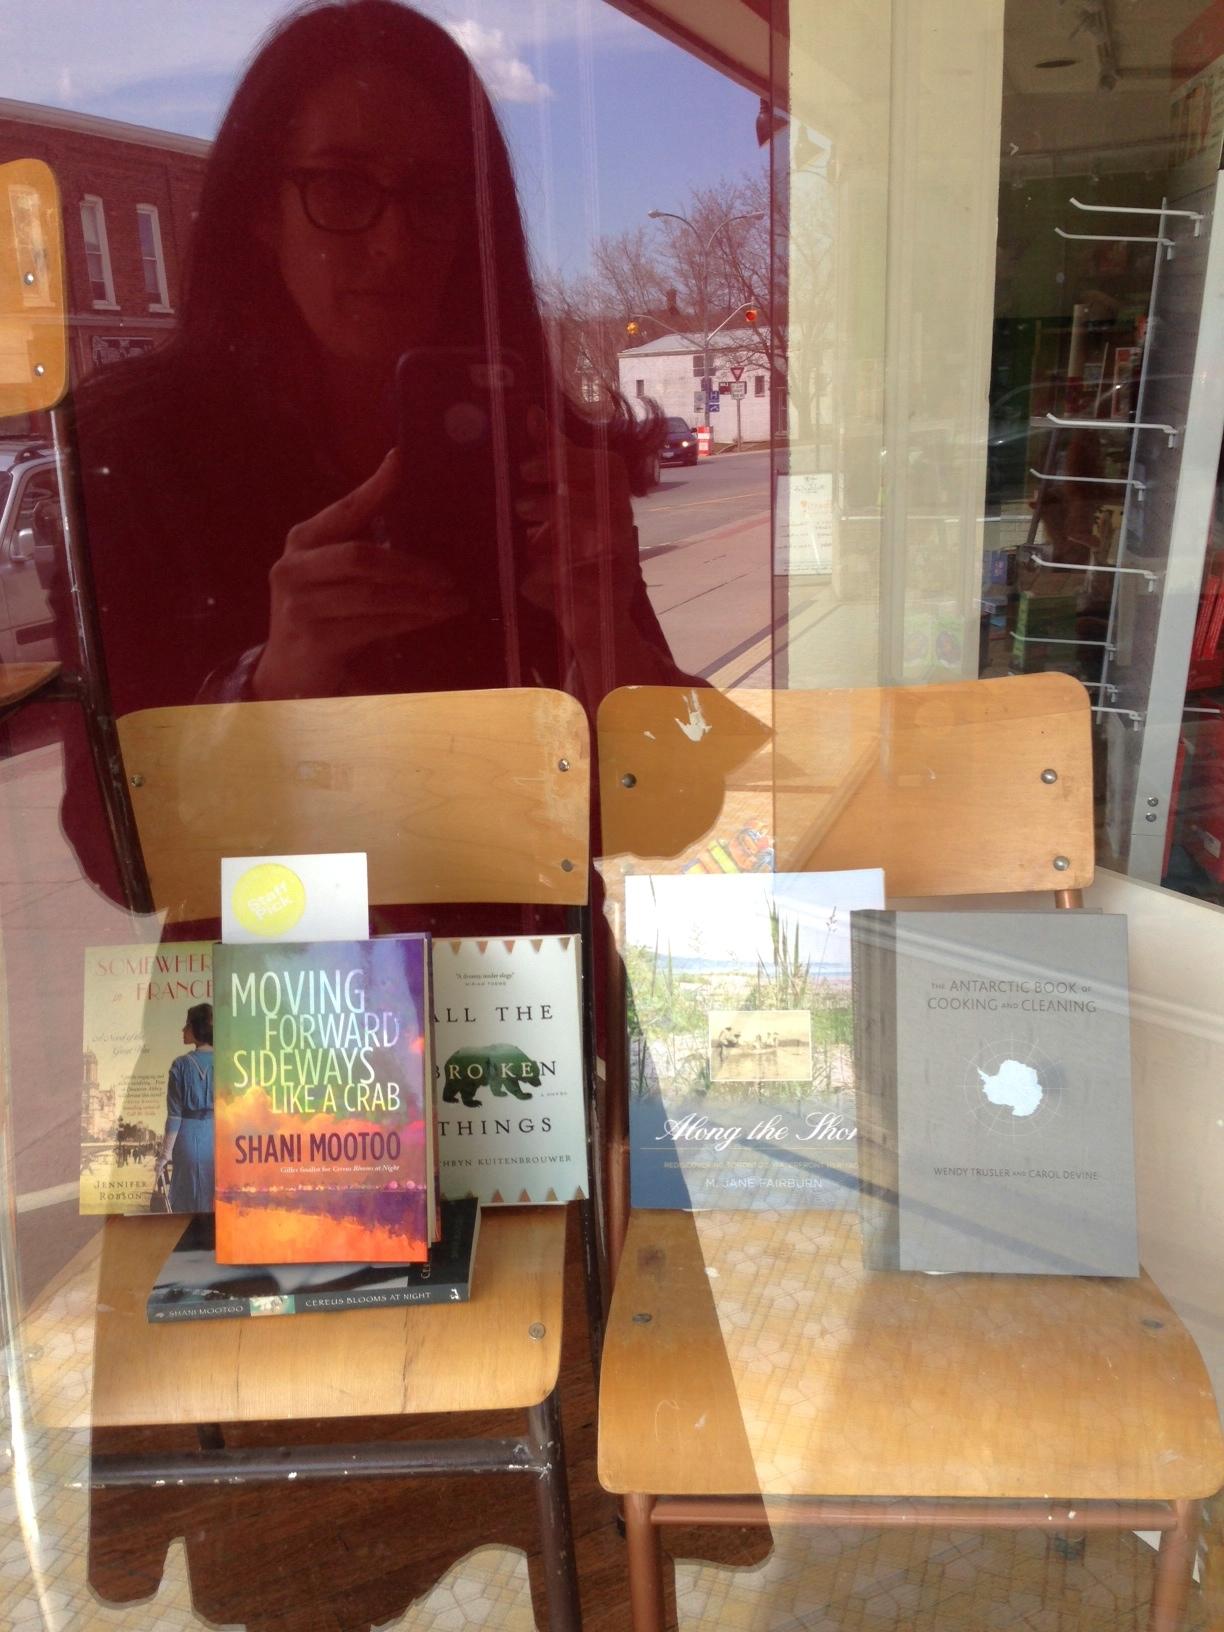 Prince Edward County Author Fest, Books & Company Apr 12, 2014